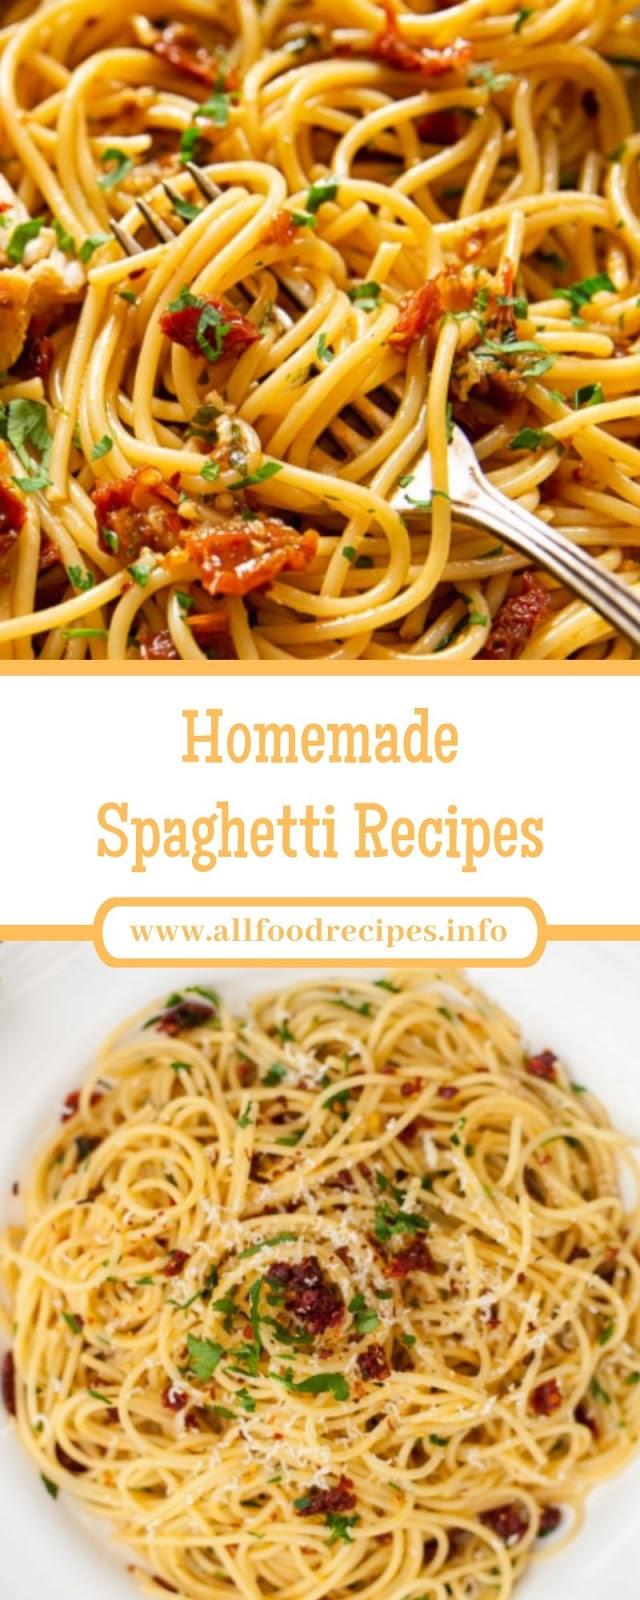 Homemade Spaghetti Recipes